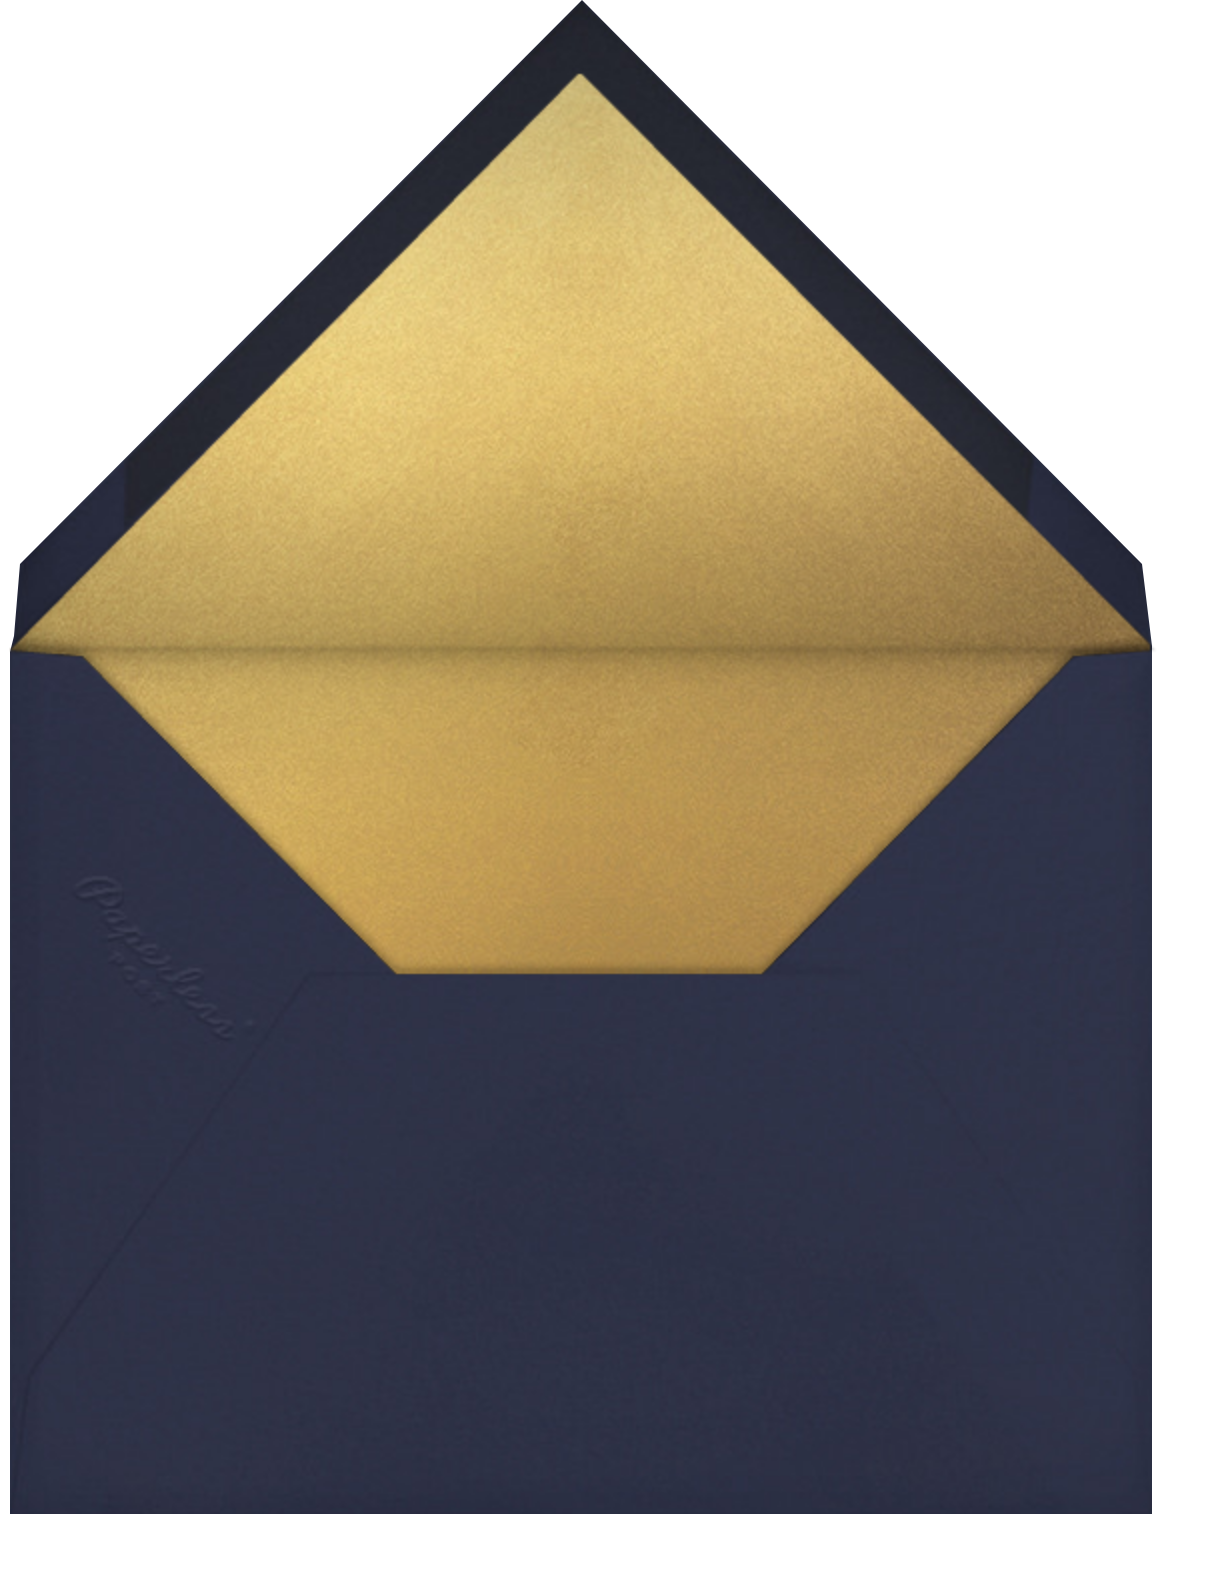 Wise Men - Paperless Post - Envelope